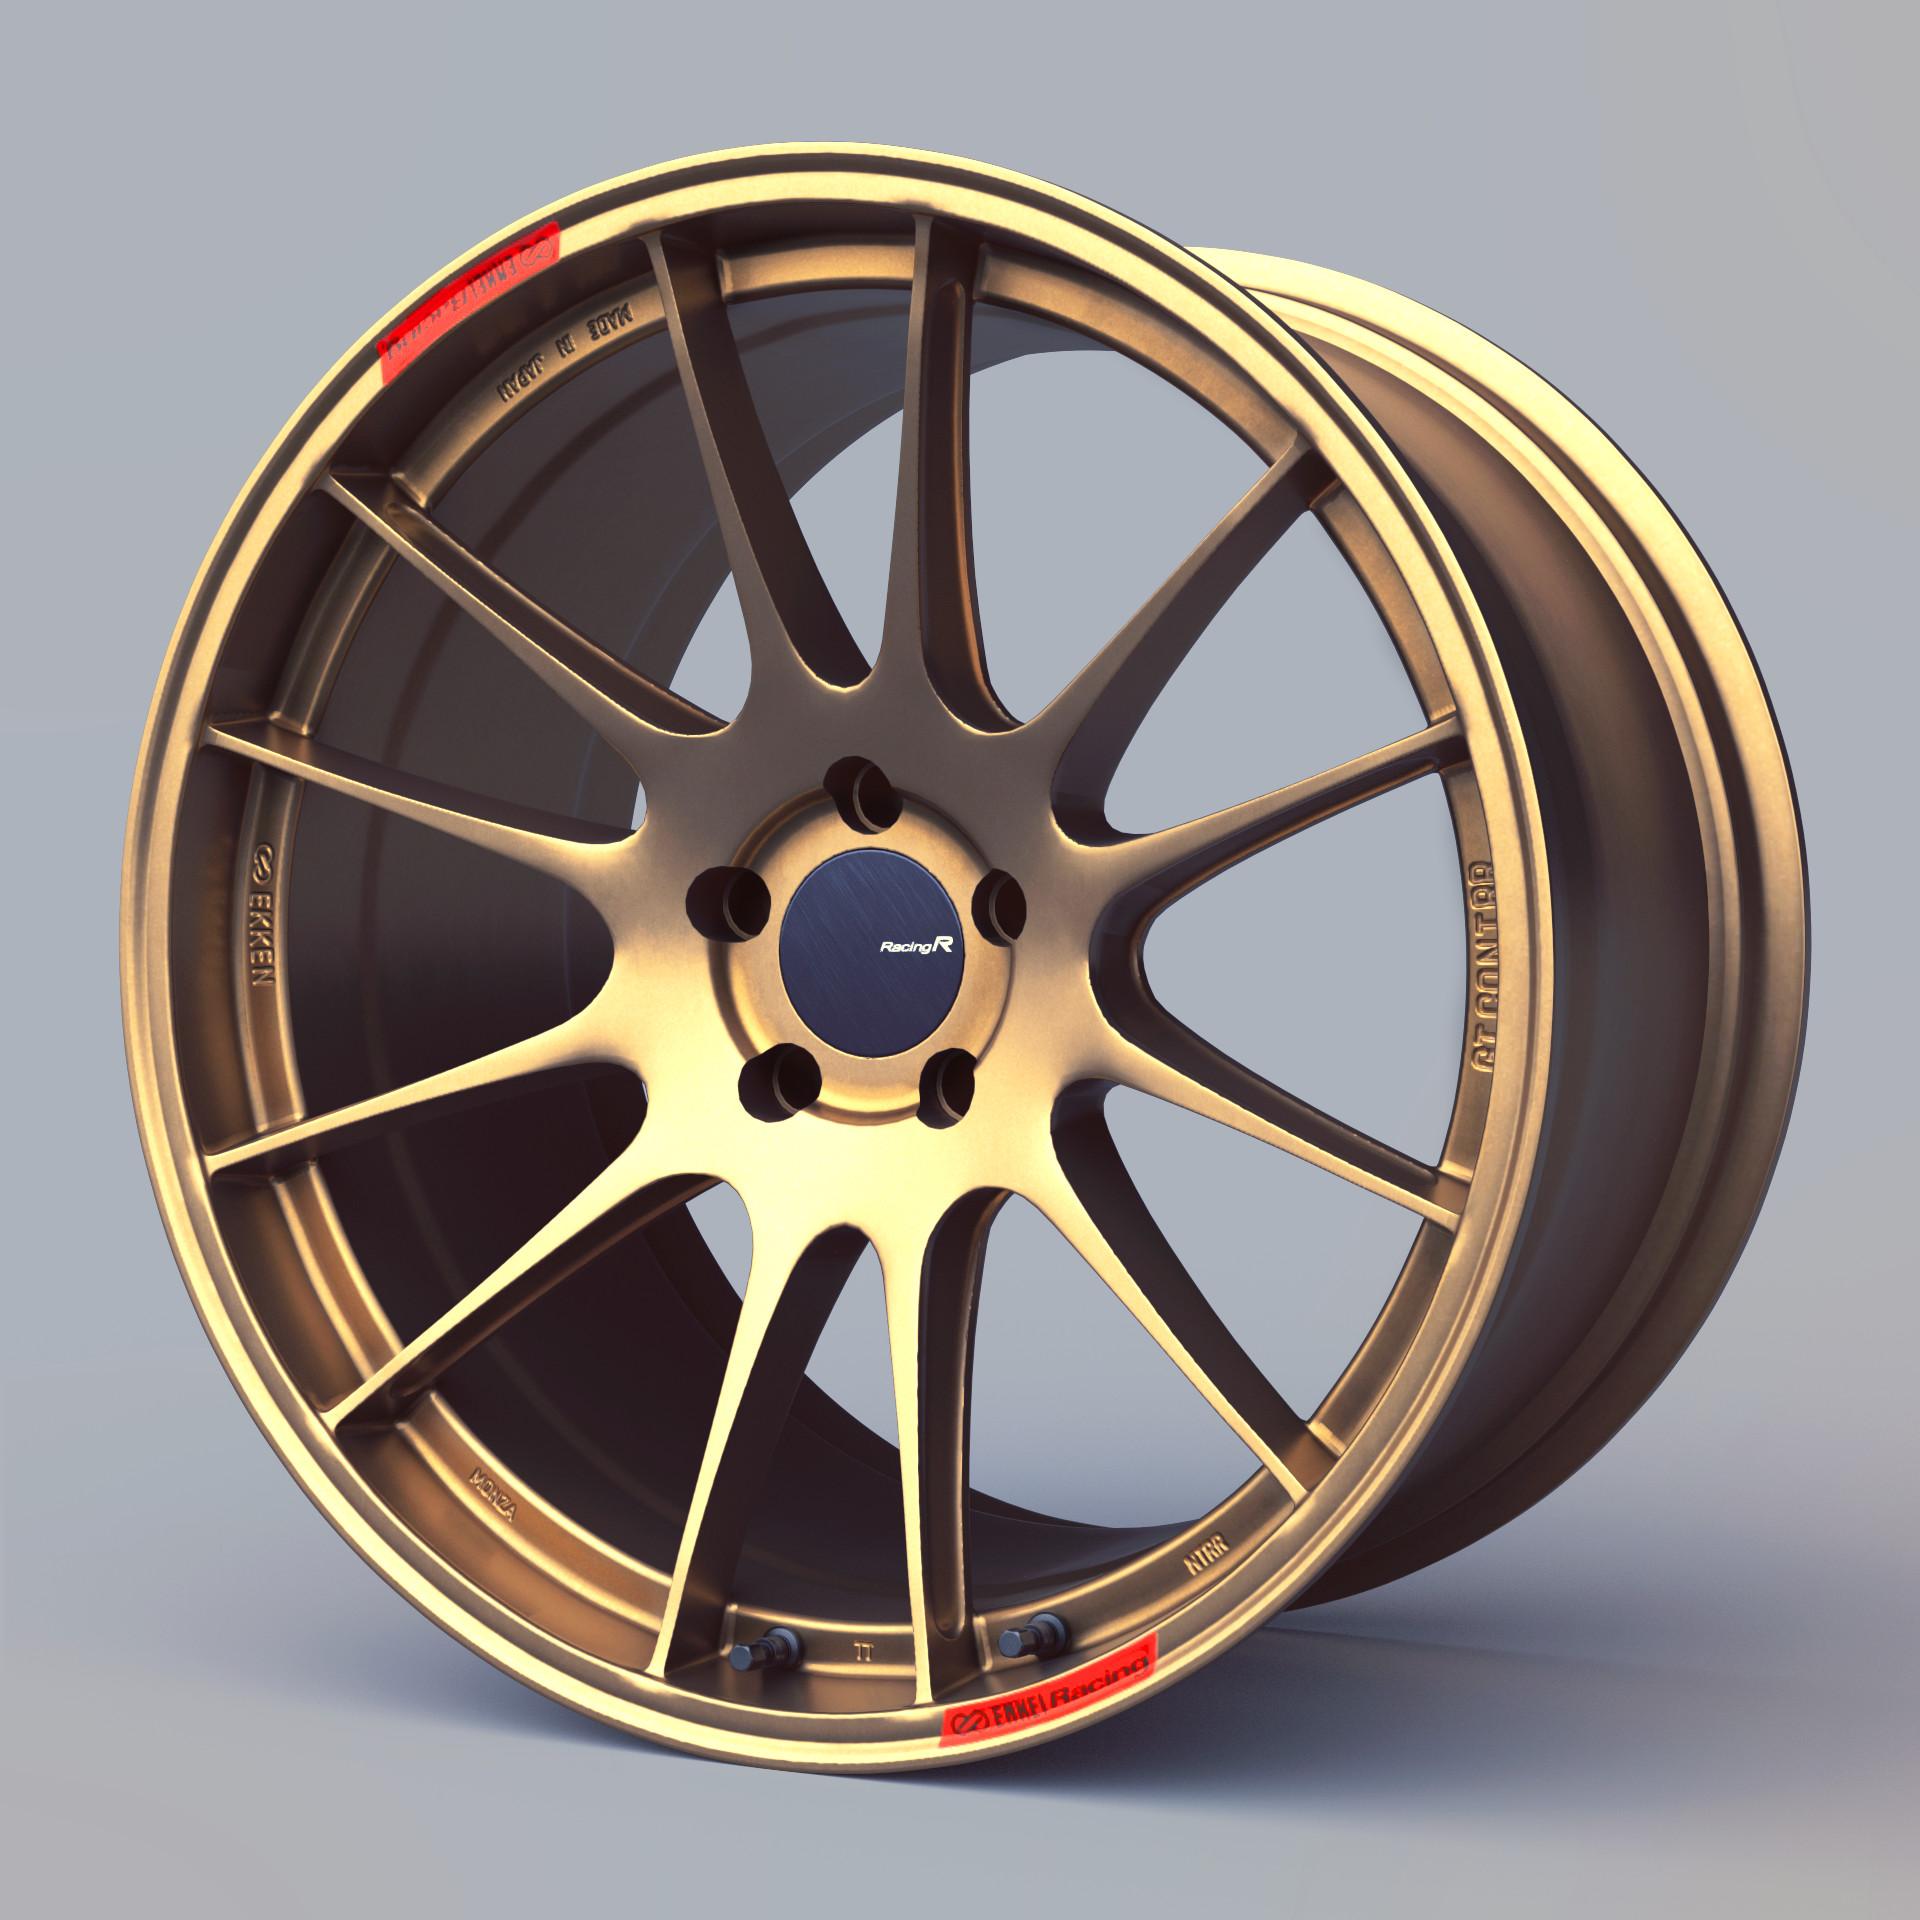 Enkei Wheel model